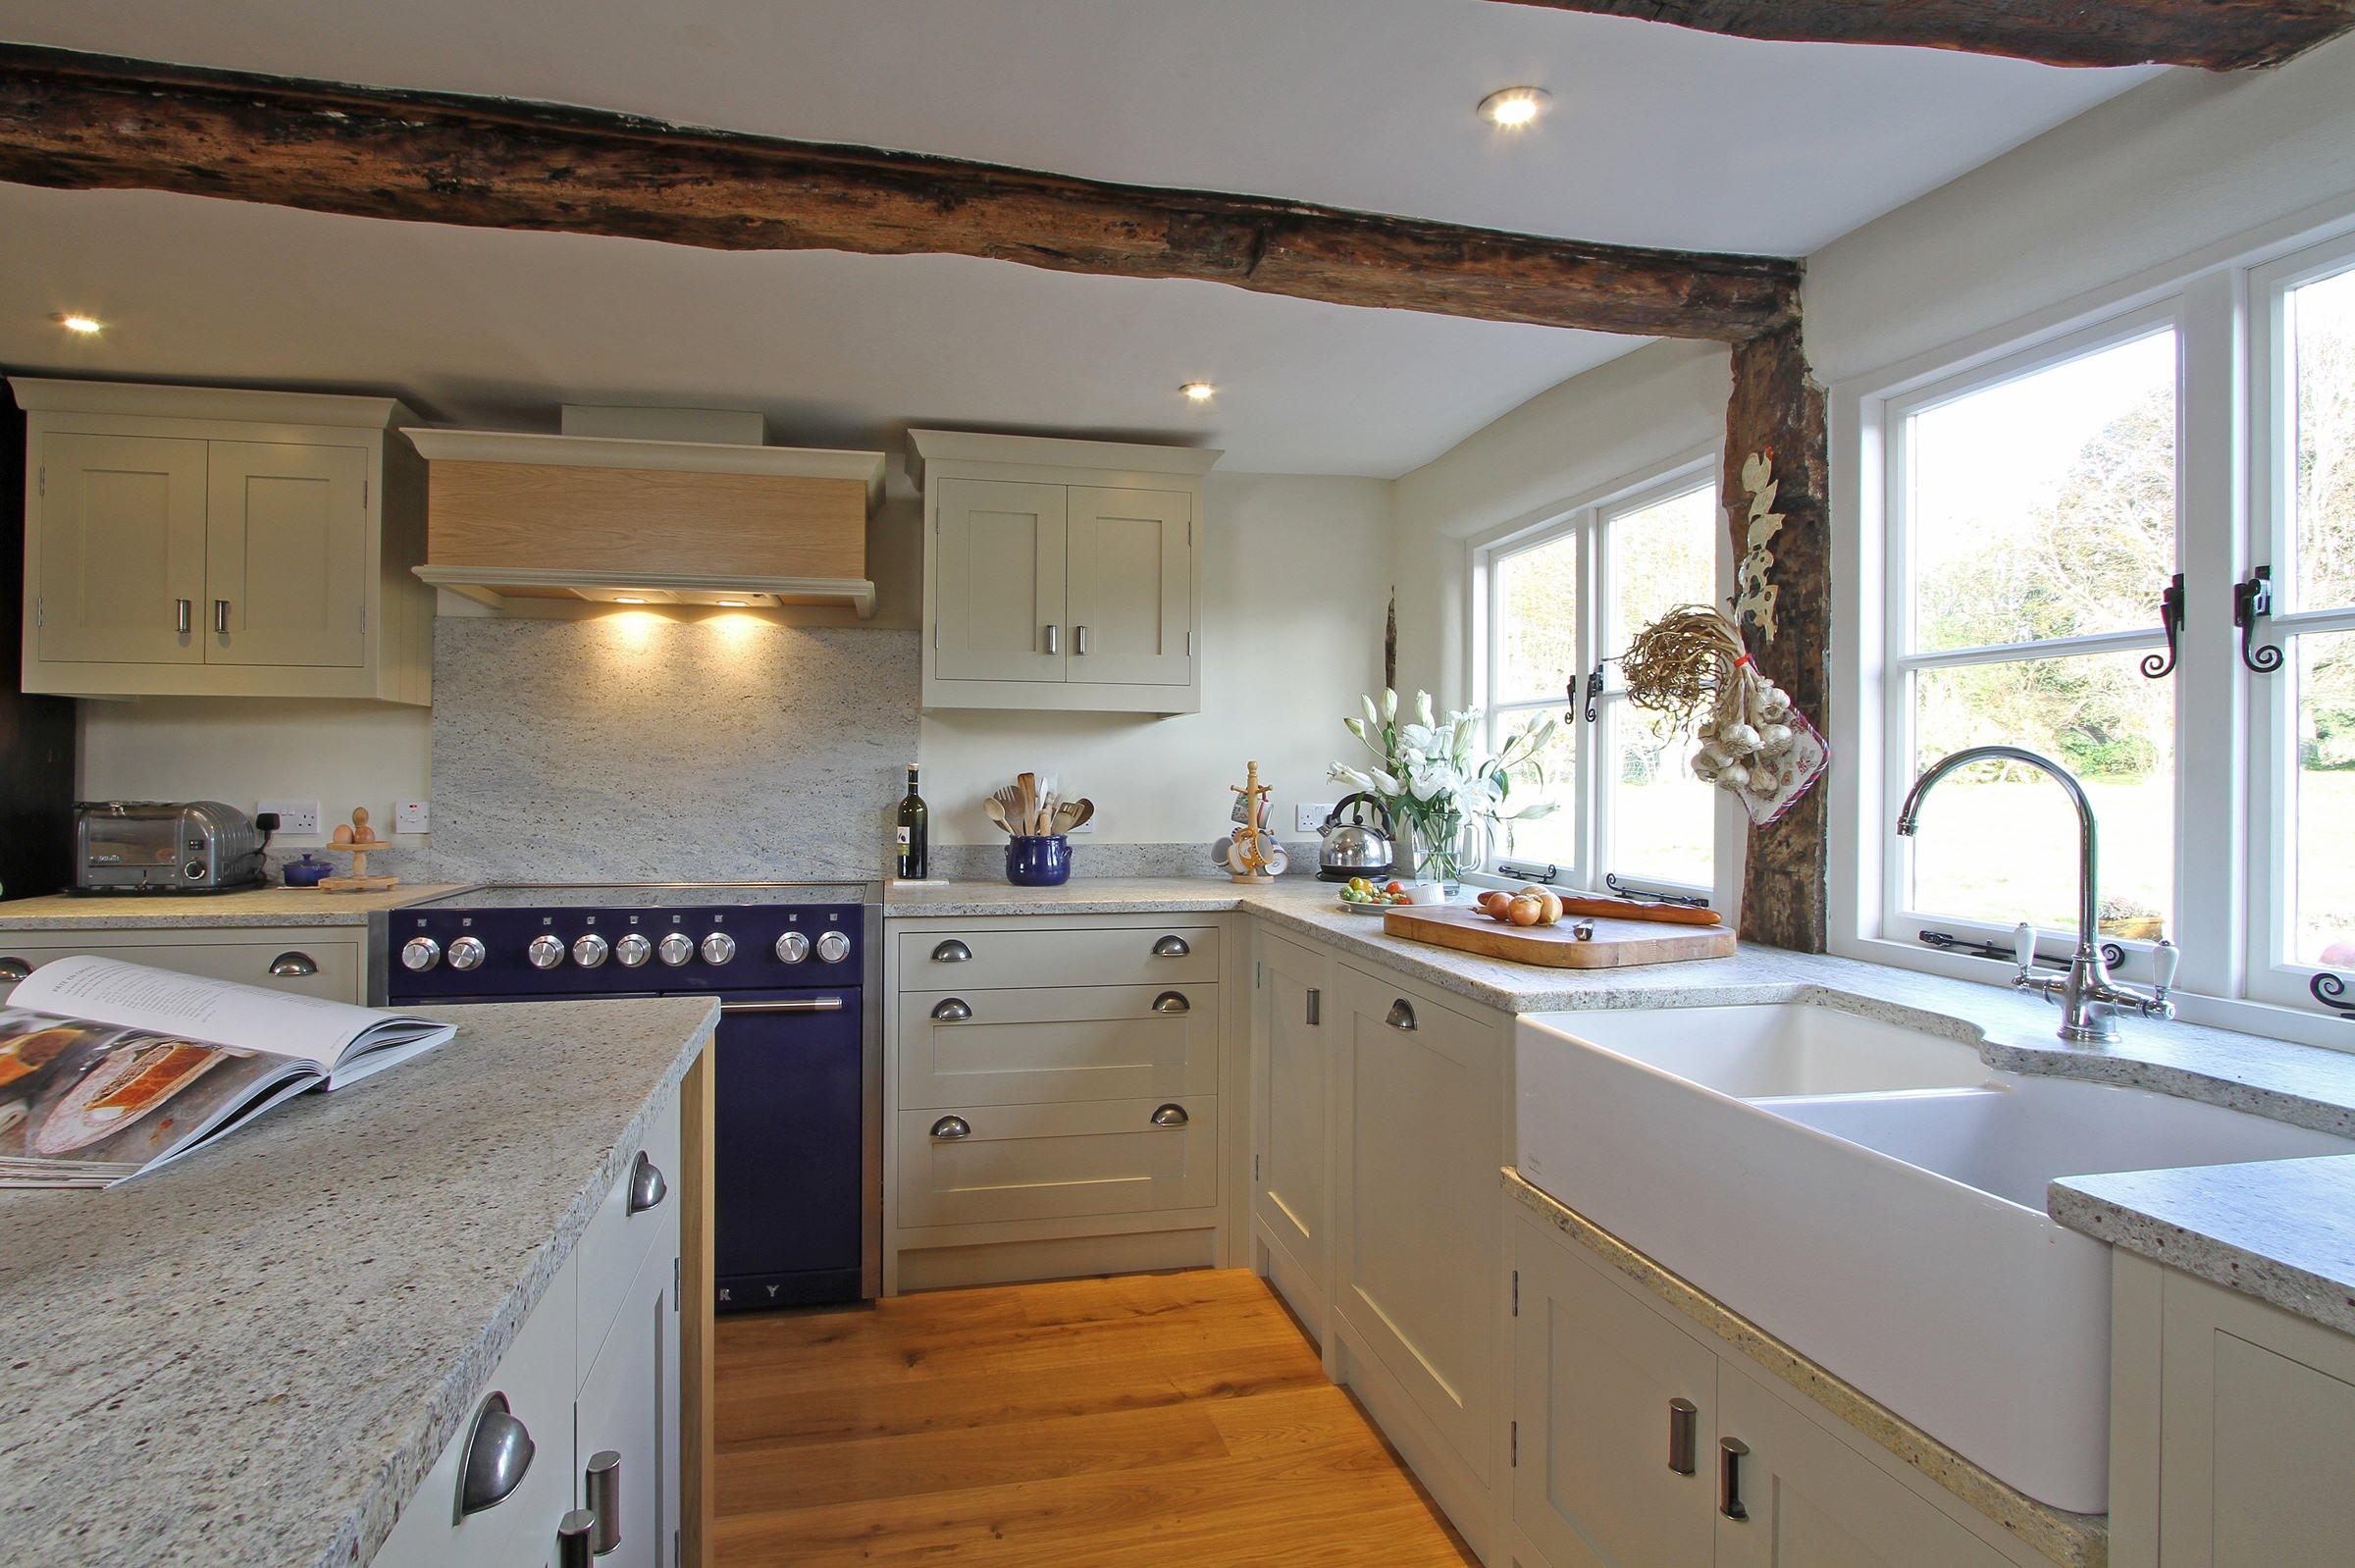 Handmade In Frame Kitchen In Old White Farmhouse Kitchen Hampshire By Bp Kitchens Interiors Houzz